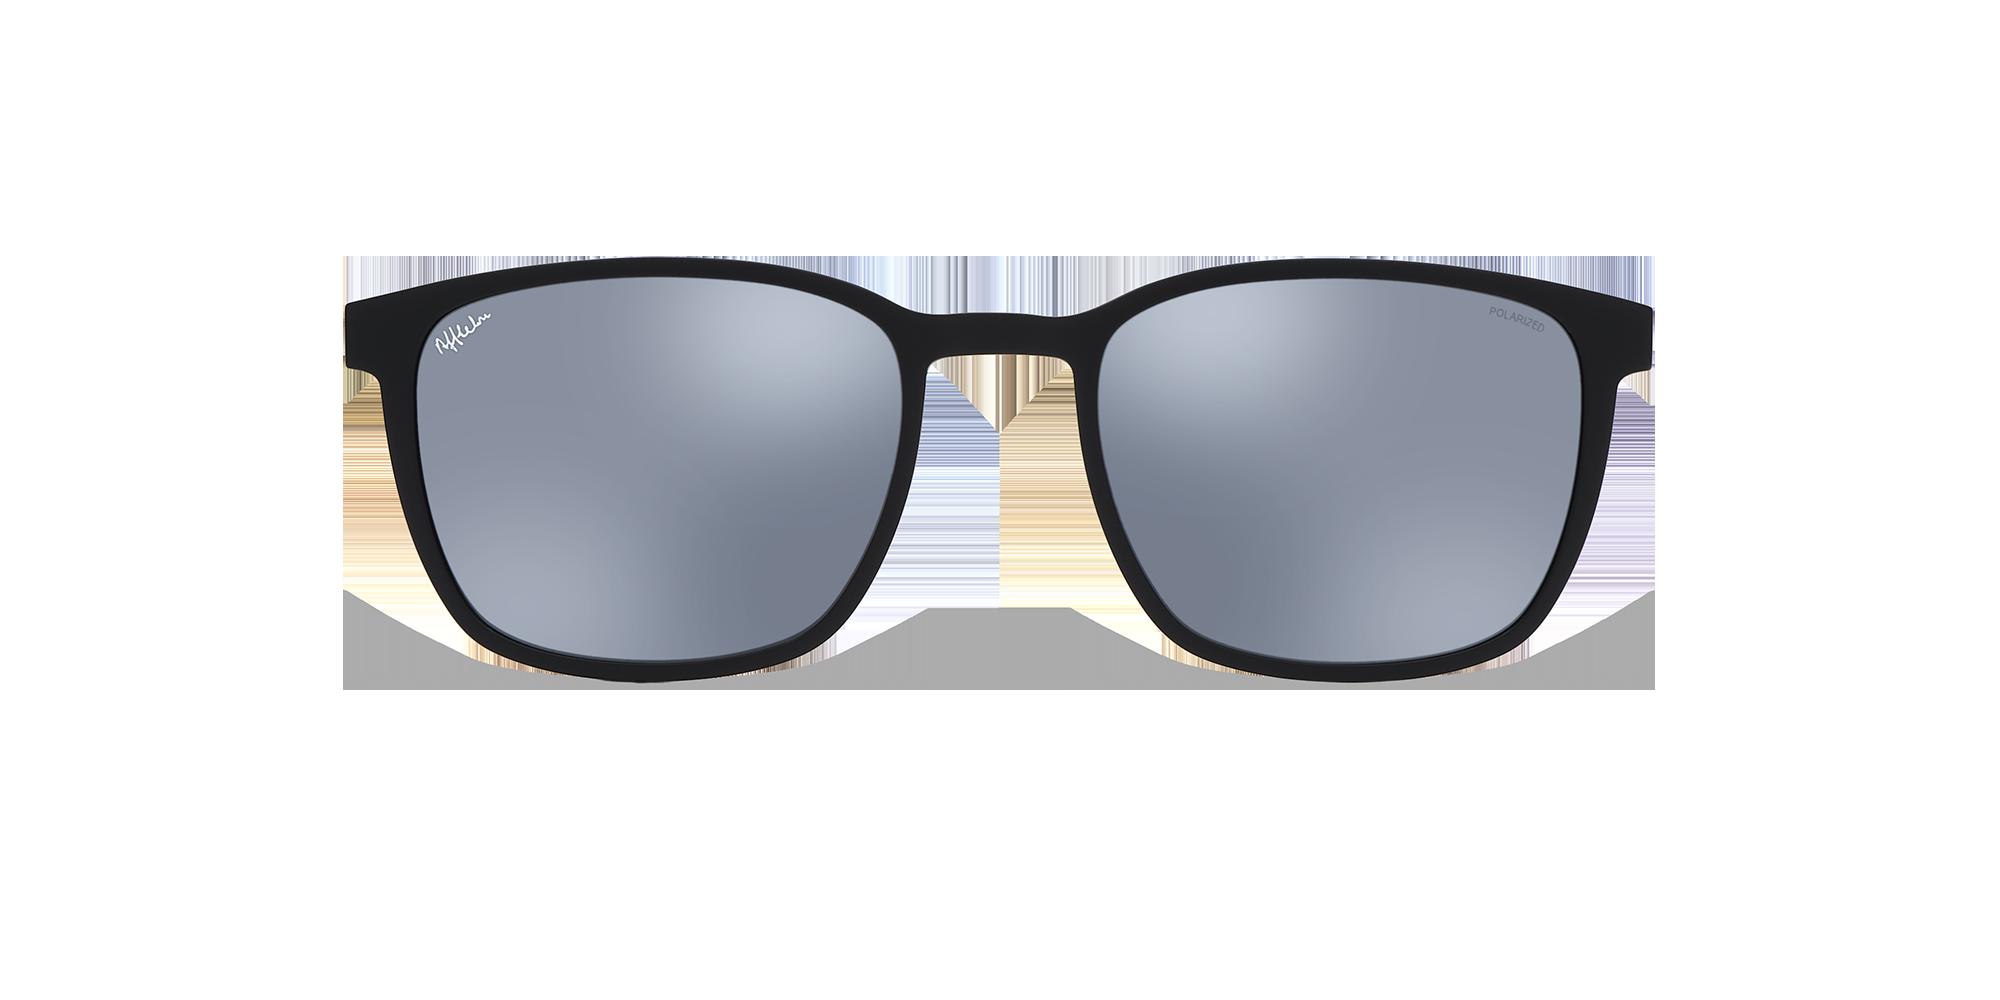 afflelou/france/products/smart_clip/clips_glasses/TMK42PRBK015319.png